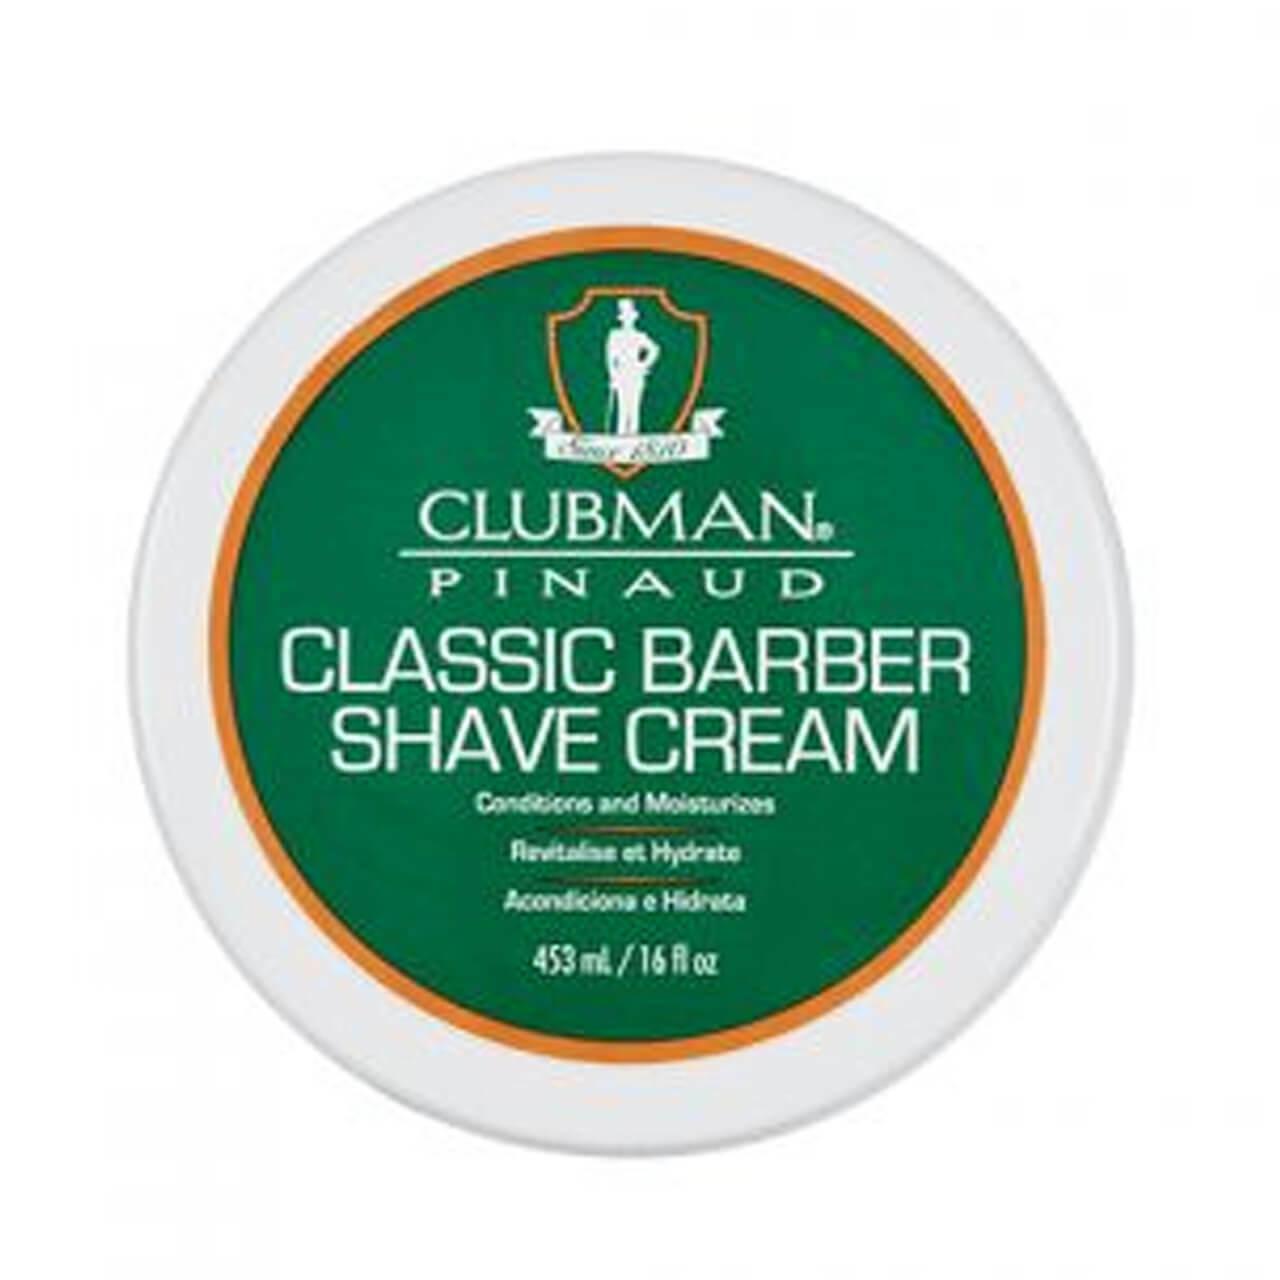 Barber Shave Cream Clubman Classic 16oz. 28006